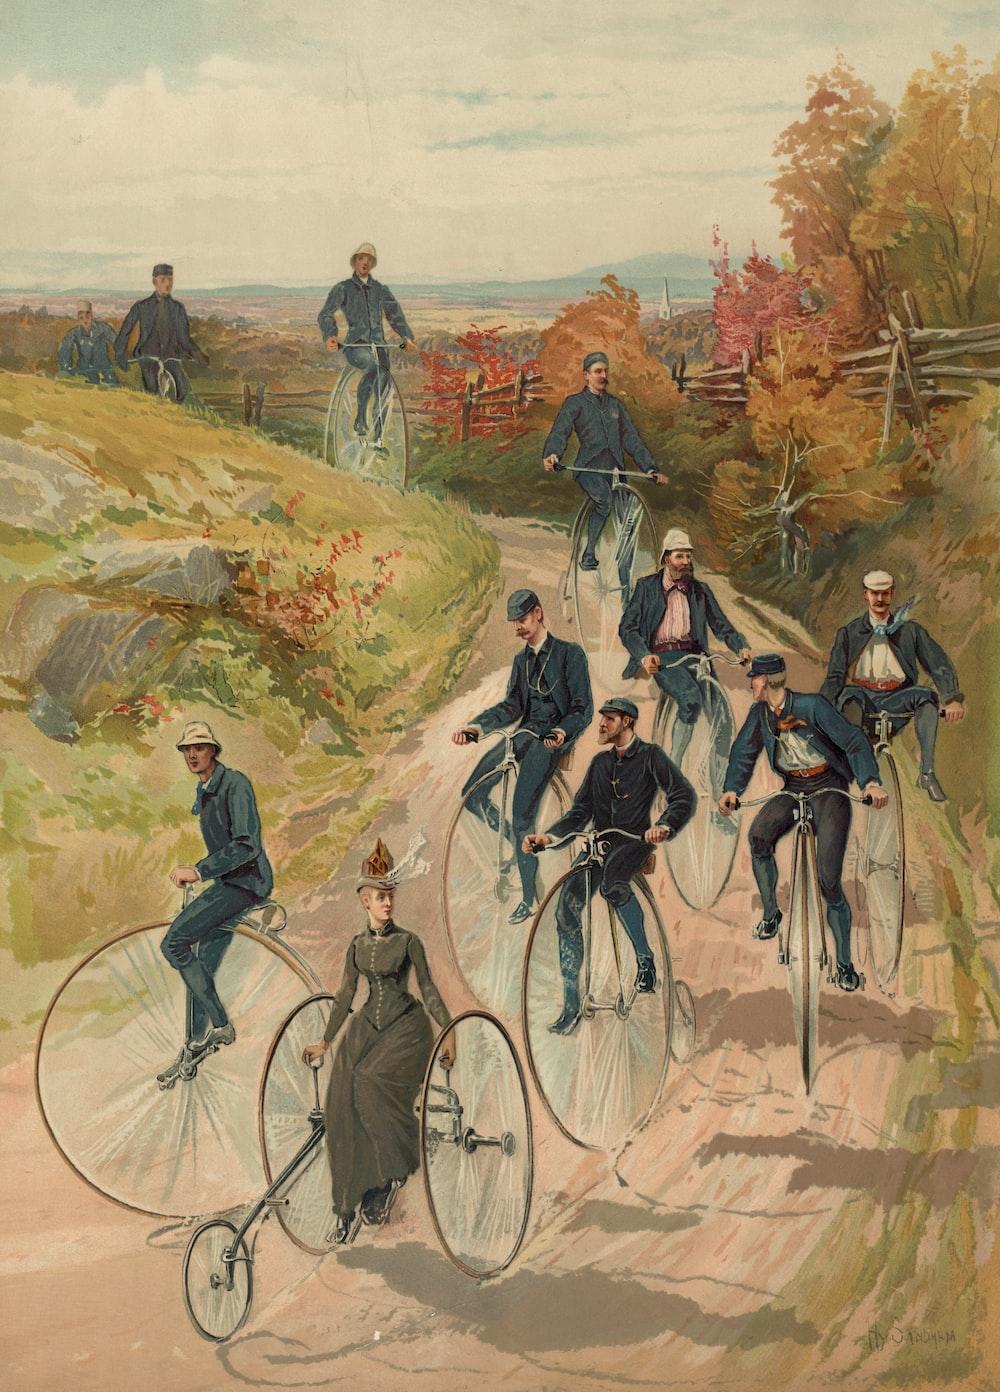 Woman, on three wheel bicycle, followed by men on high-wheelers.